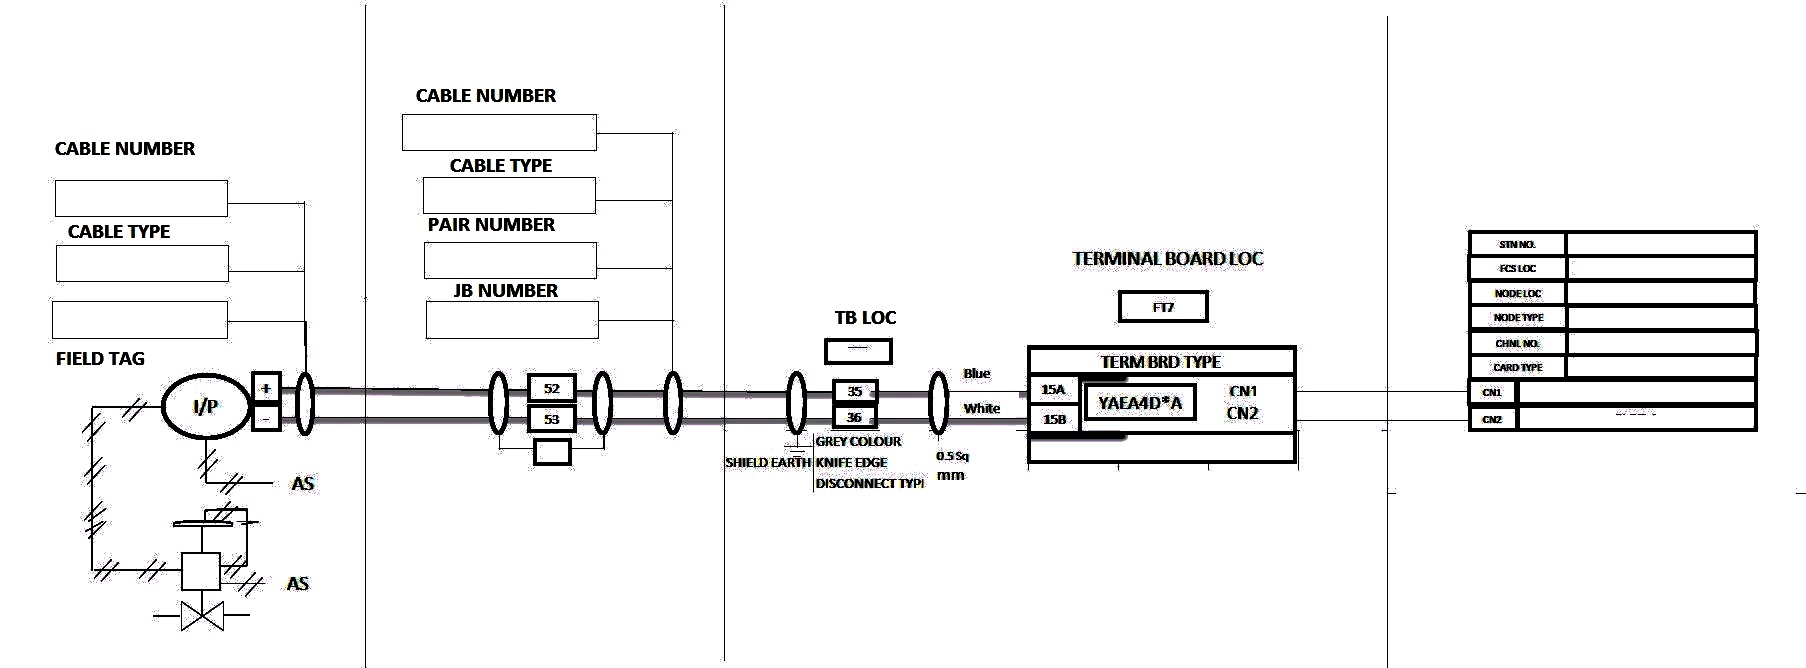 DIAGRAM] Instrument Loop Wiring Diagrams FULL Version HD Quality ...